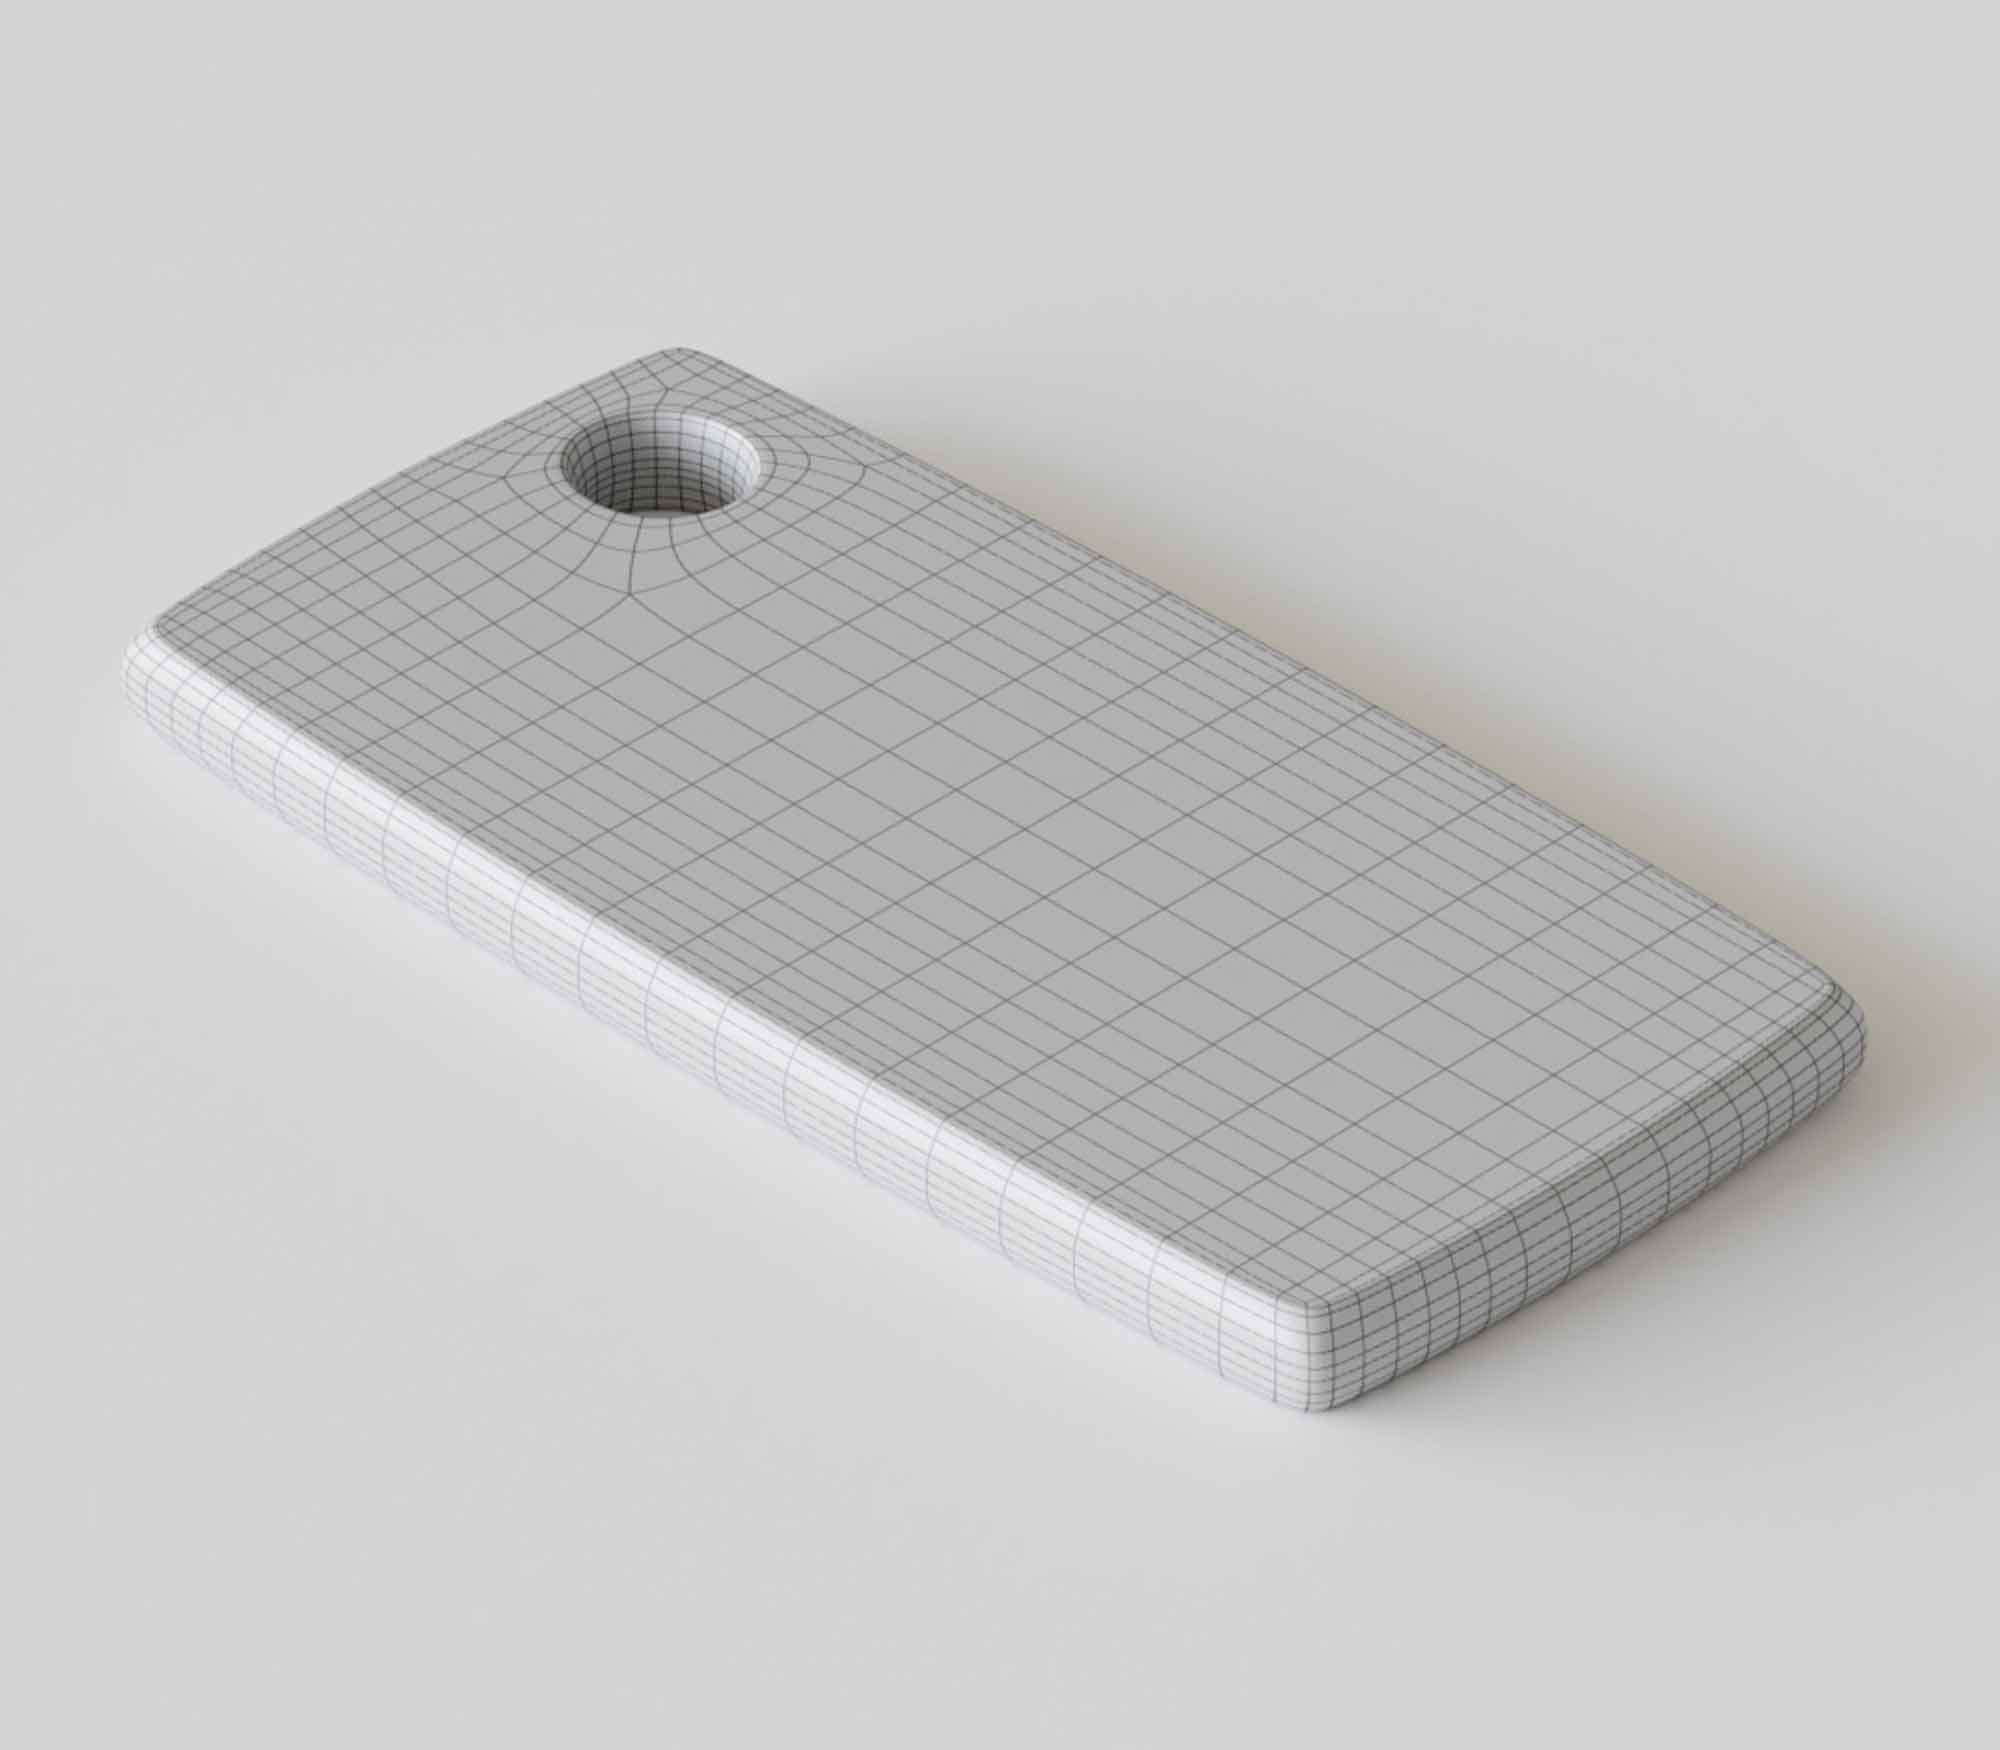 Kitchenware 3D Model 4